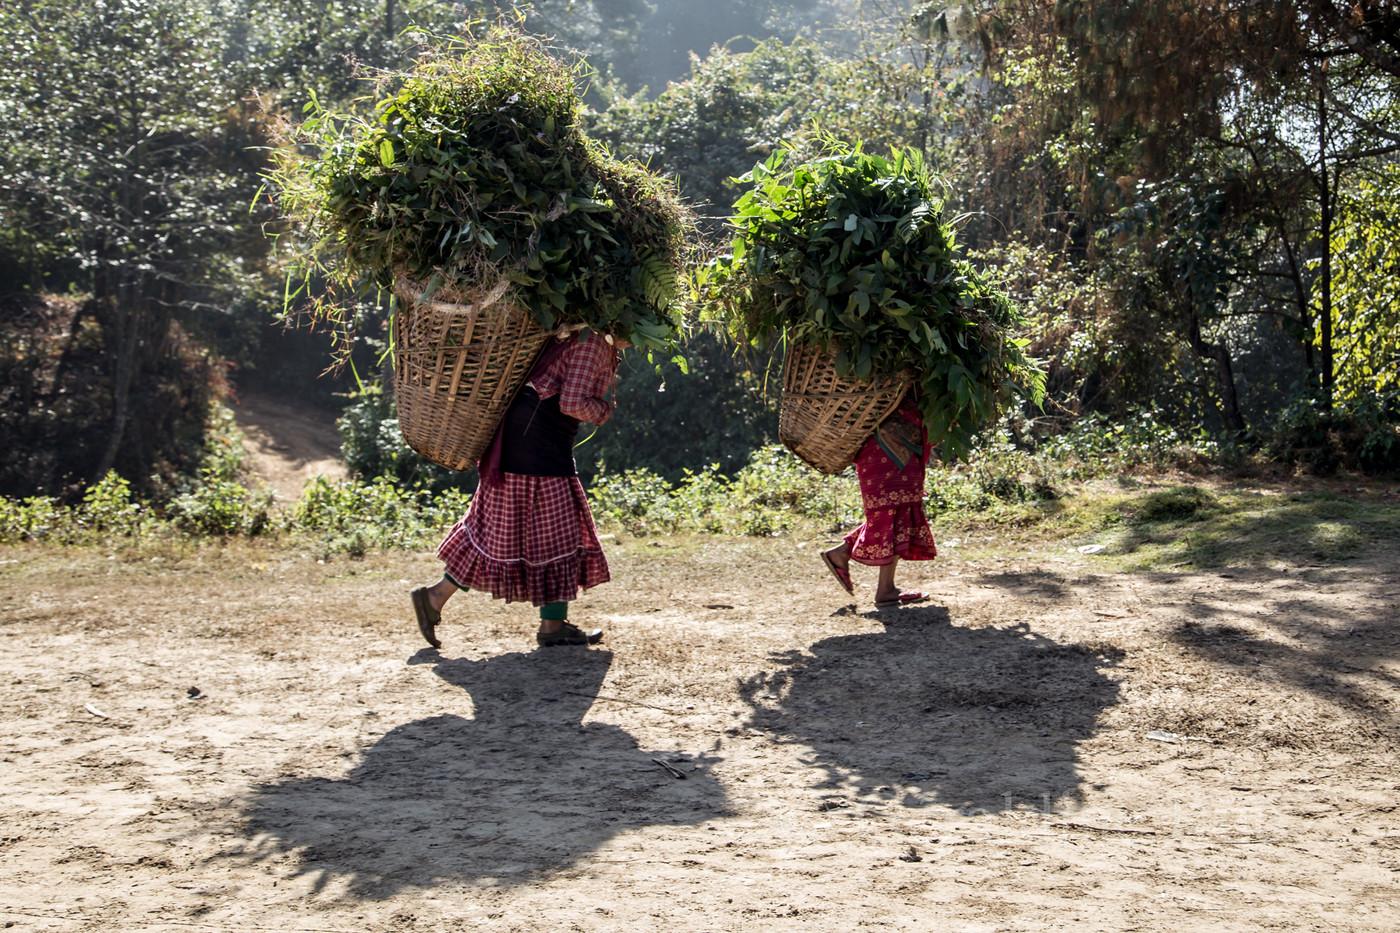 Népal 155639© Géraldine Rué.jpg